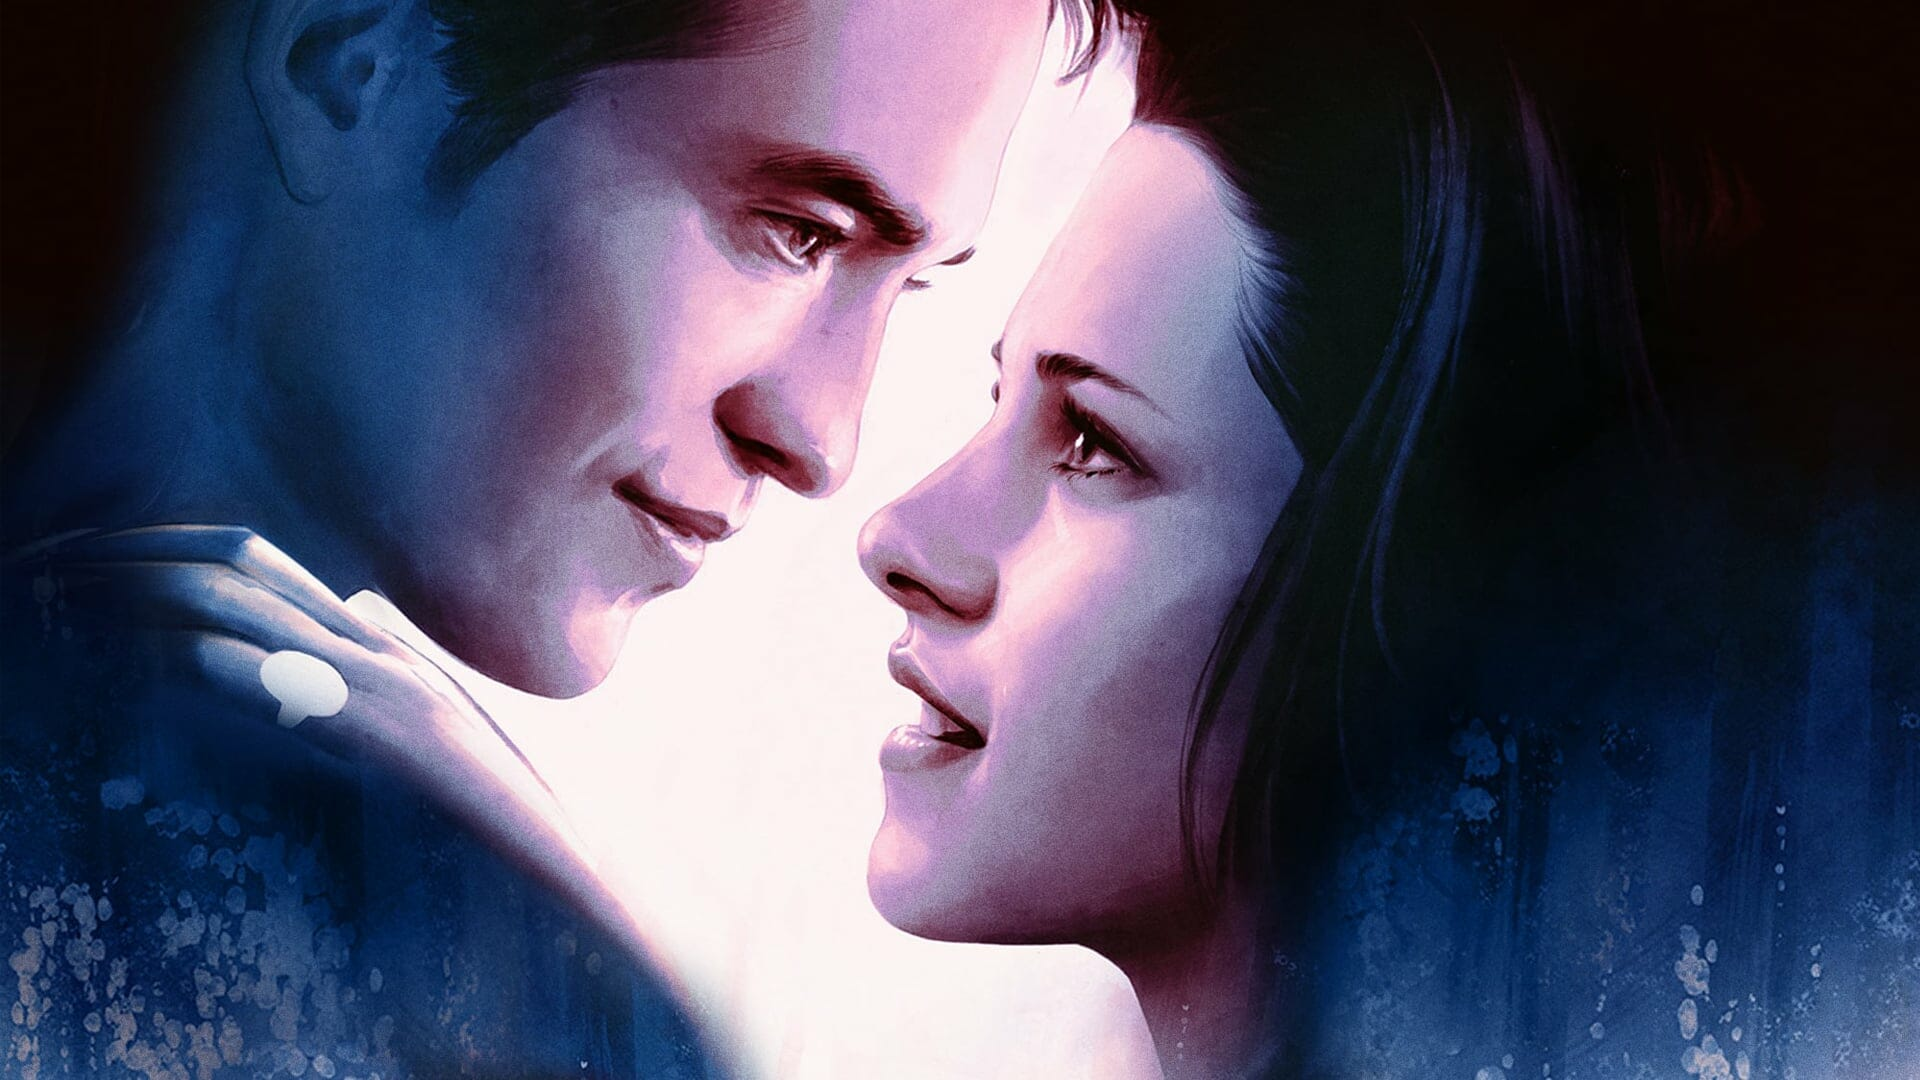 Where can you watch The Twilight Saga